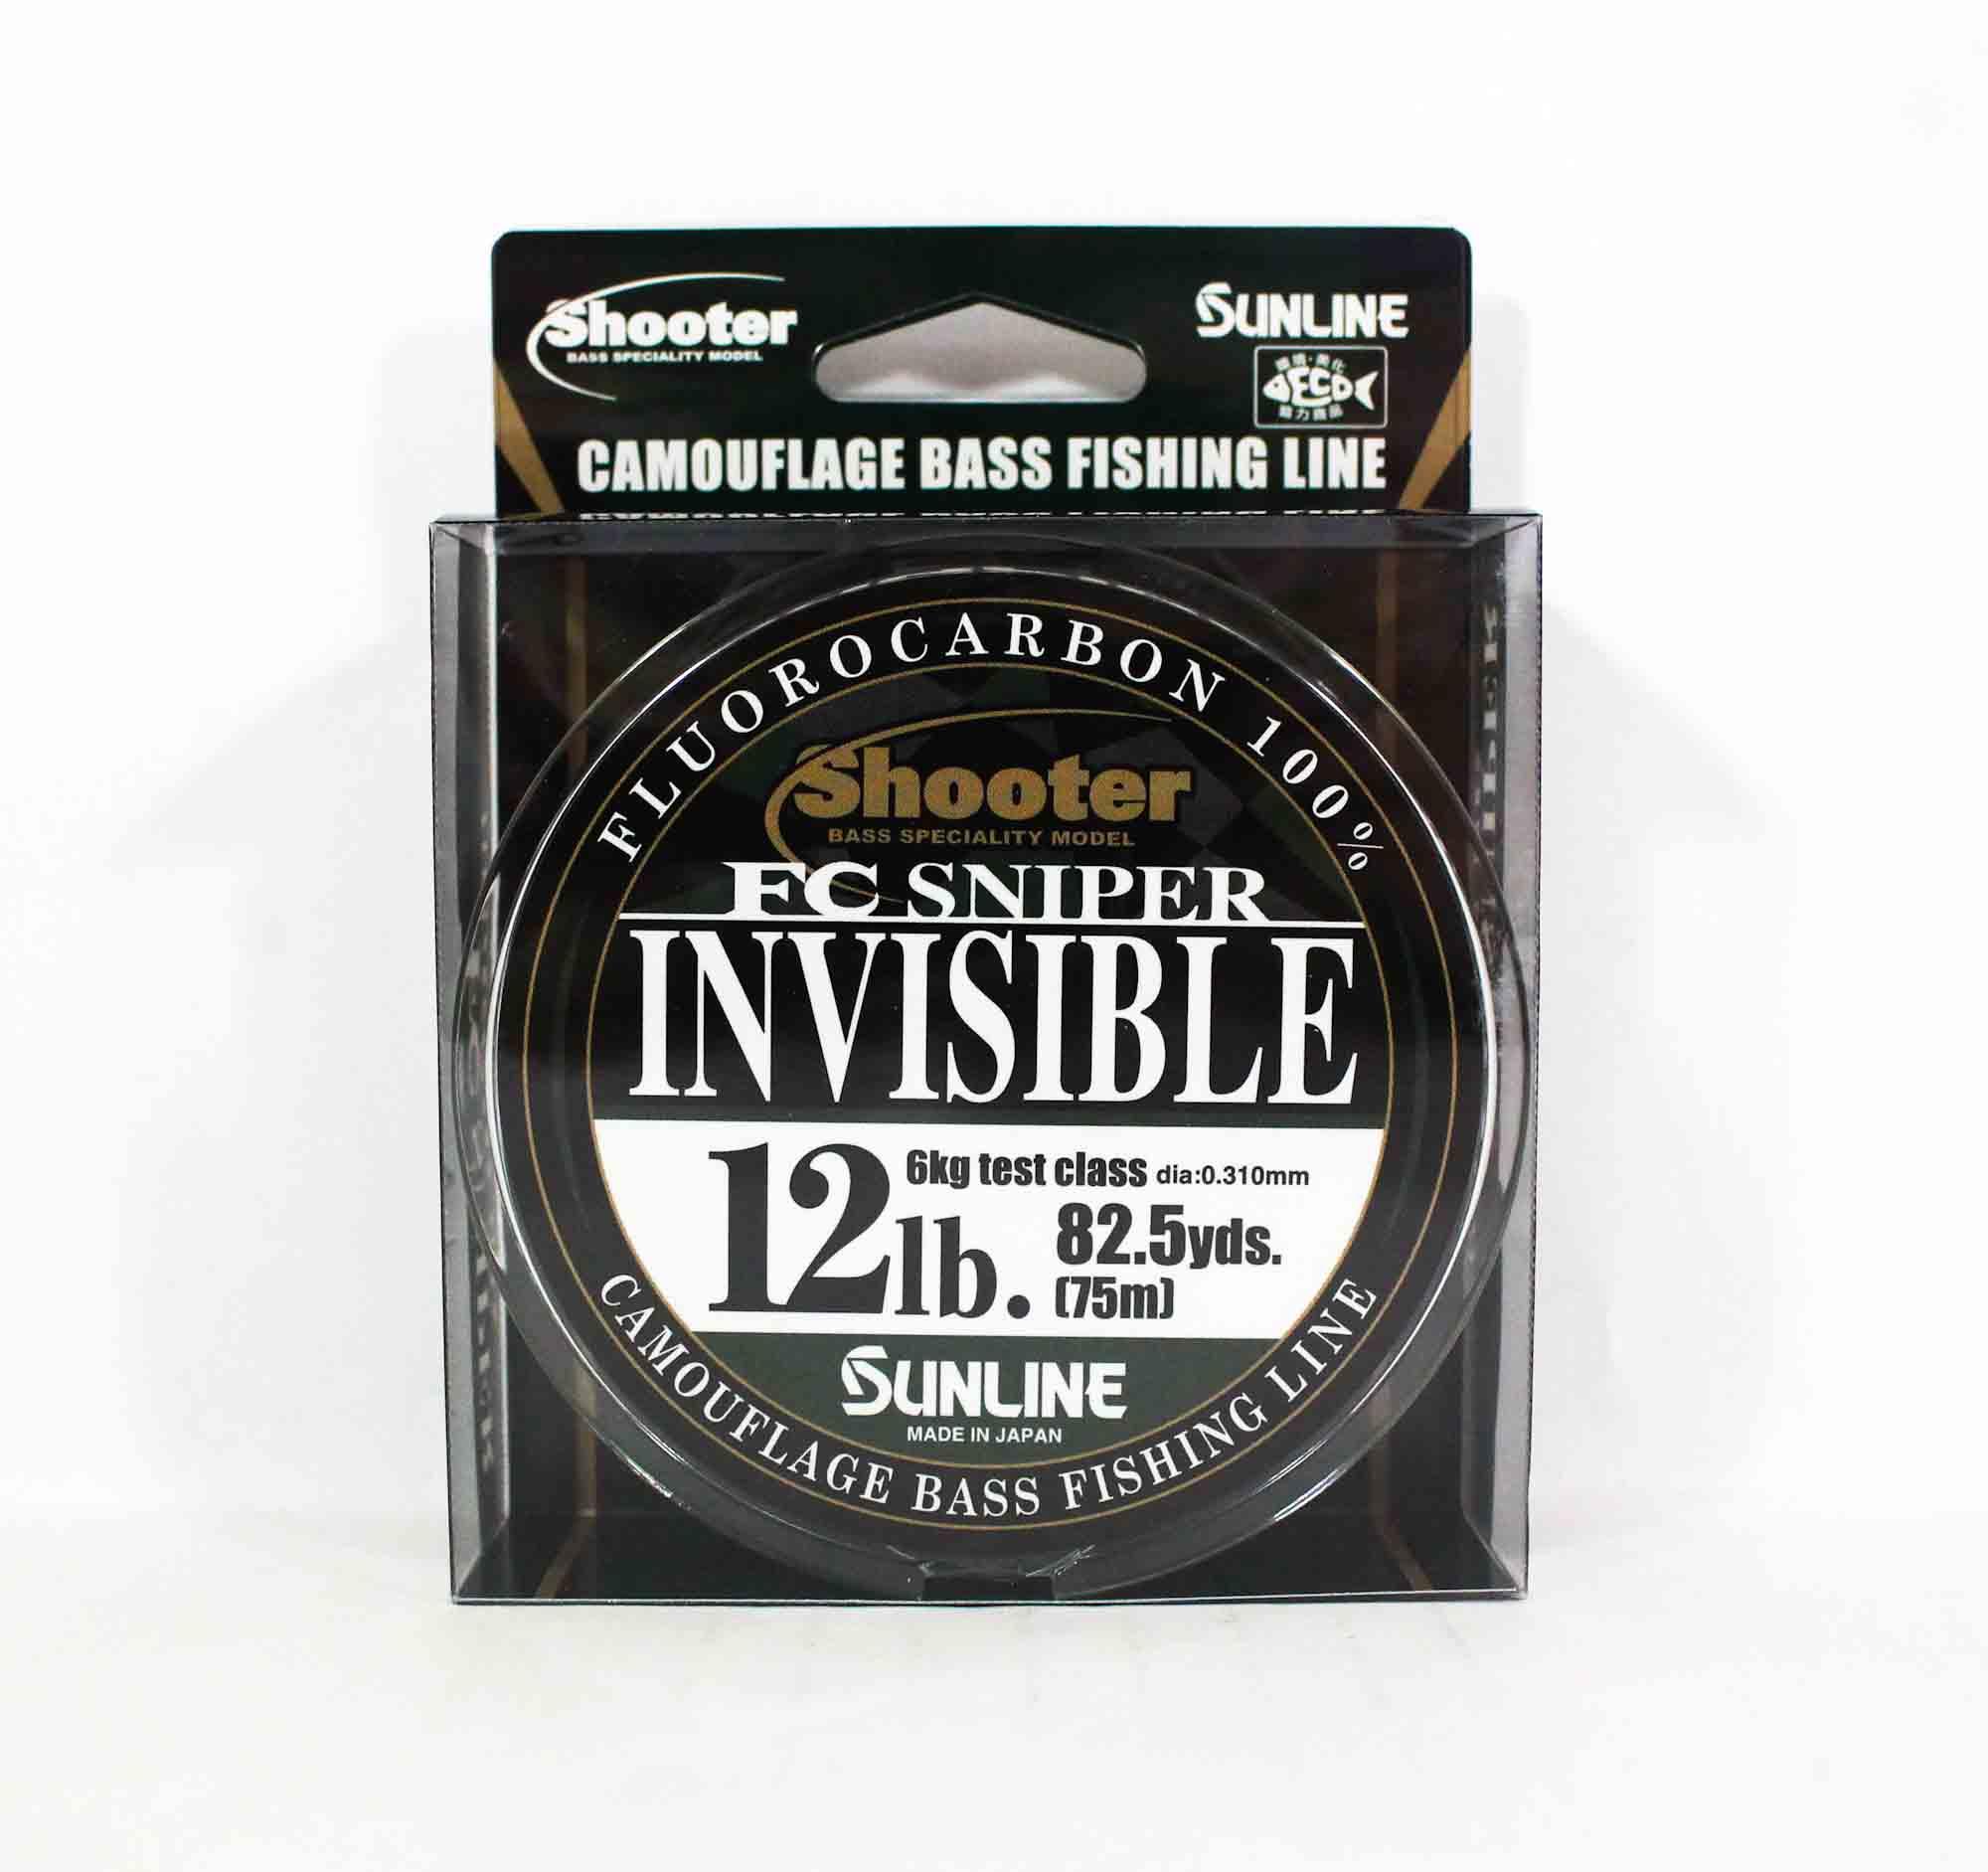 Sunline Fluorocarbon Line FC Sniper Invisible 75m 12lb 0.31mm (2216)